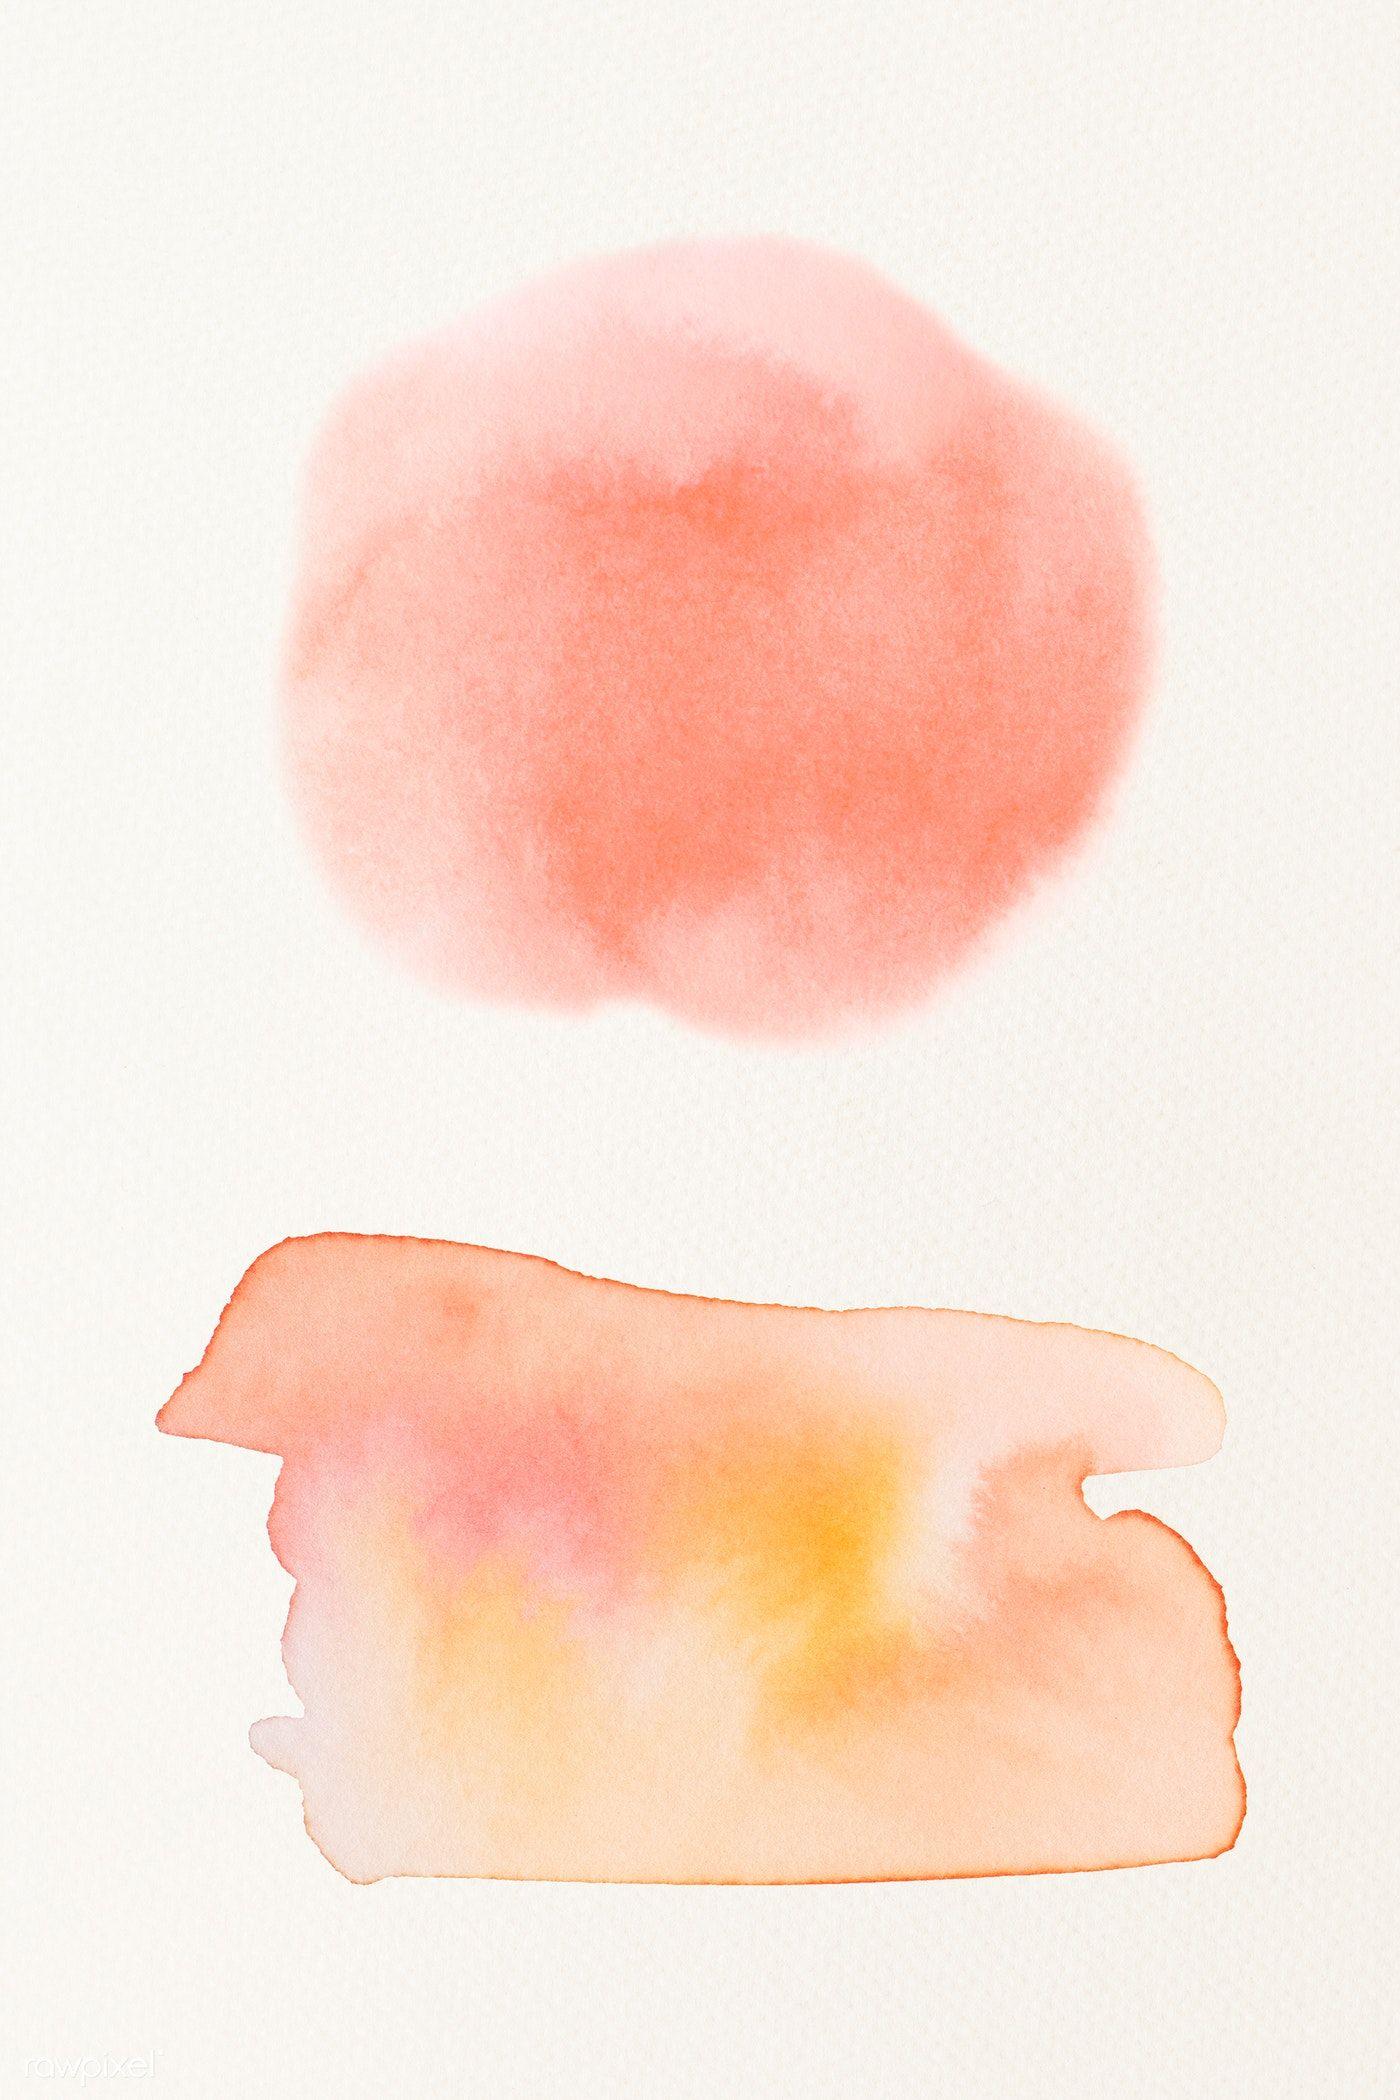 Abstract orange and yellow watercolor splash illustration